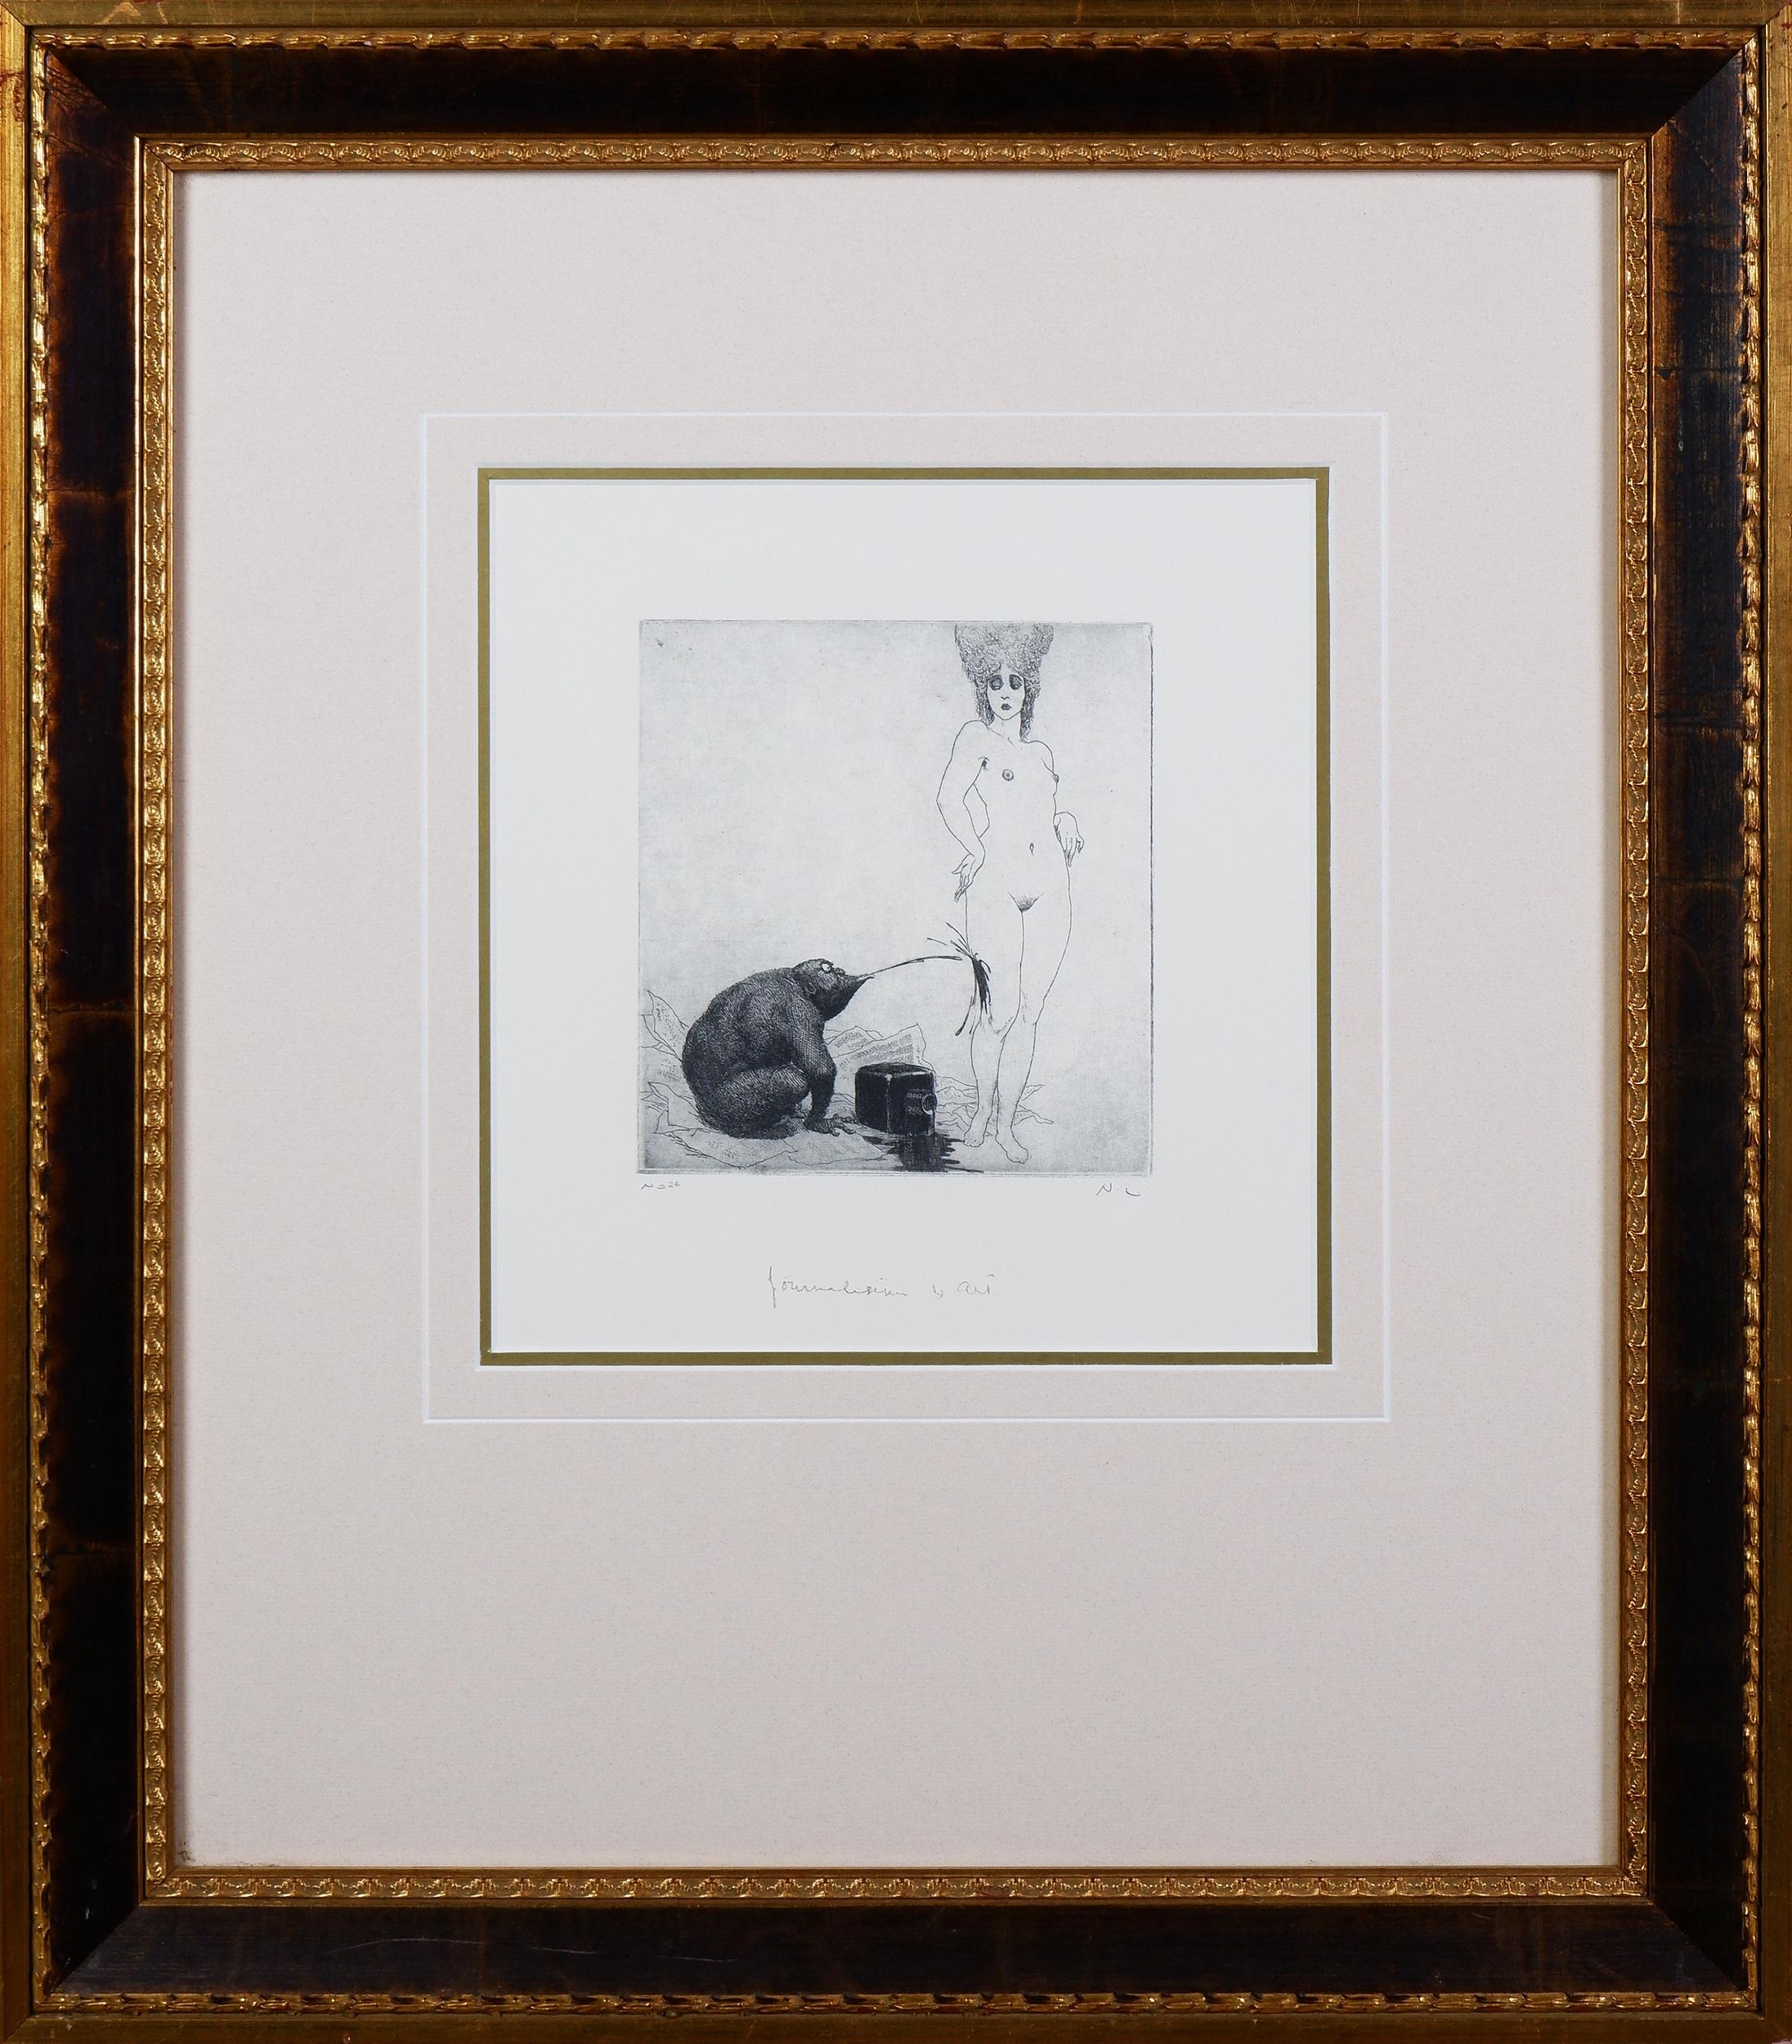 'Norman Lindsay (1879-1969), Journalism & Art, Facsimile Etching, 15 x 14 cm'